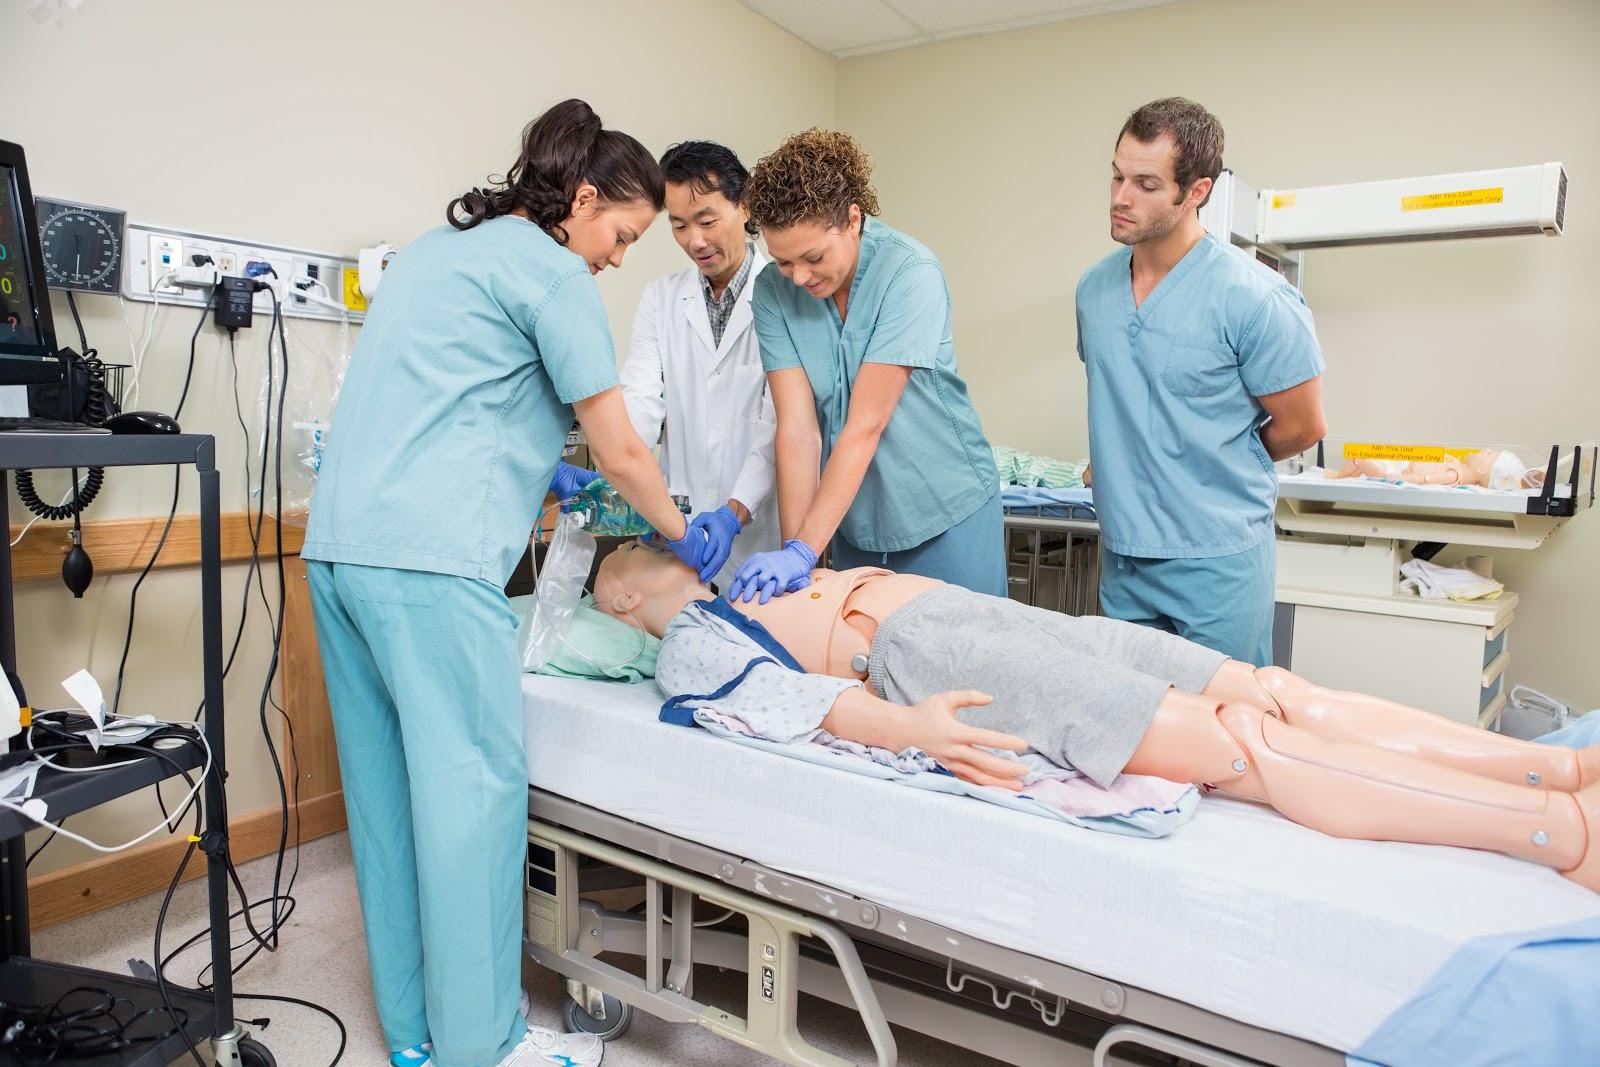 BSN Programs: Nurse performing CPR on dummy patient